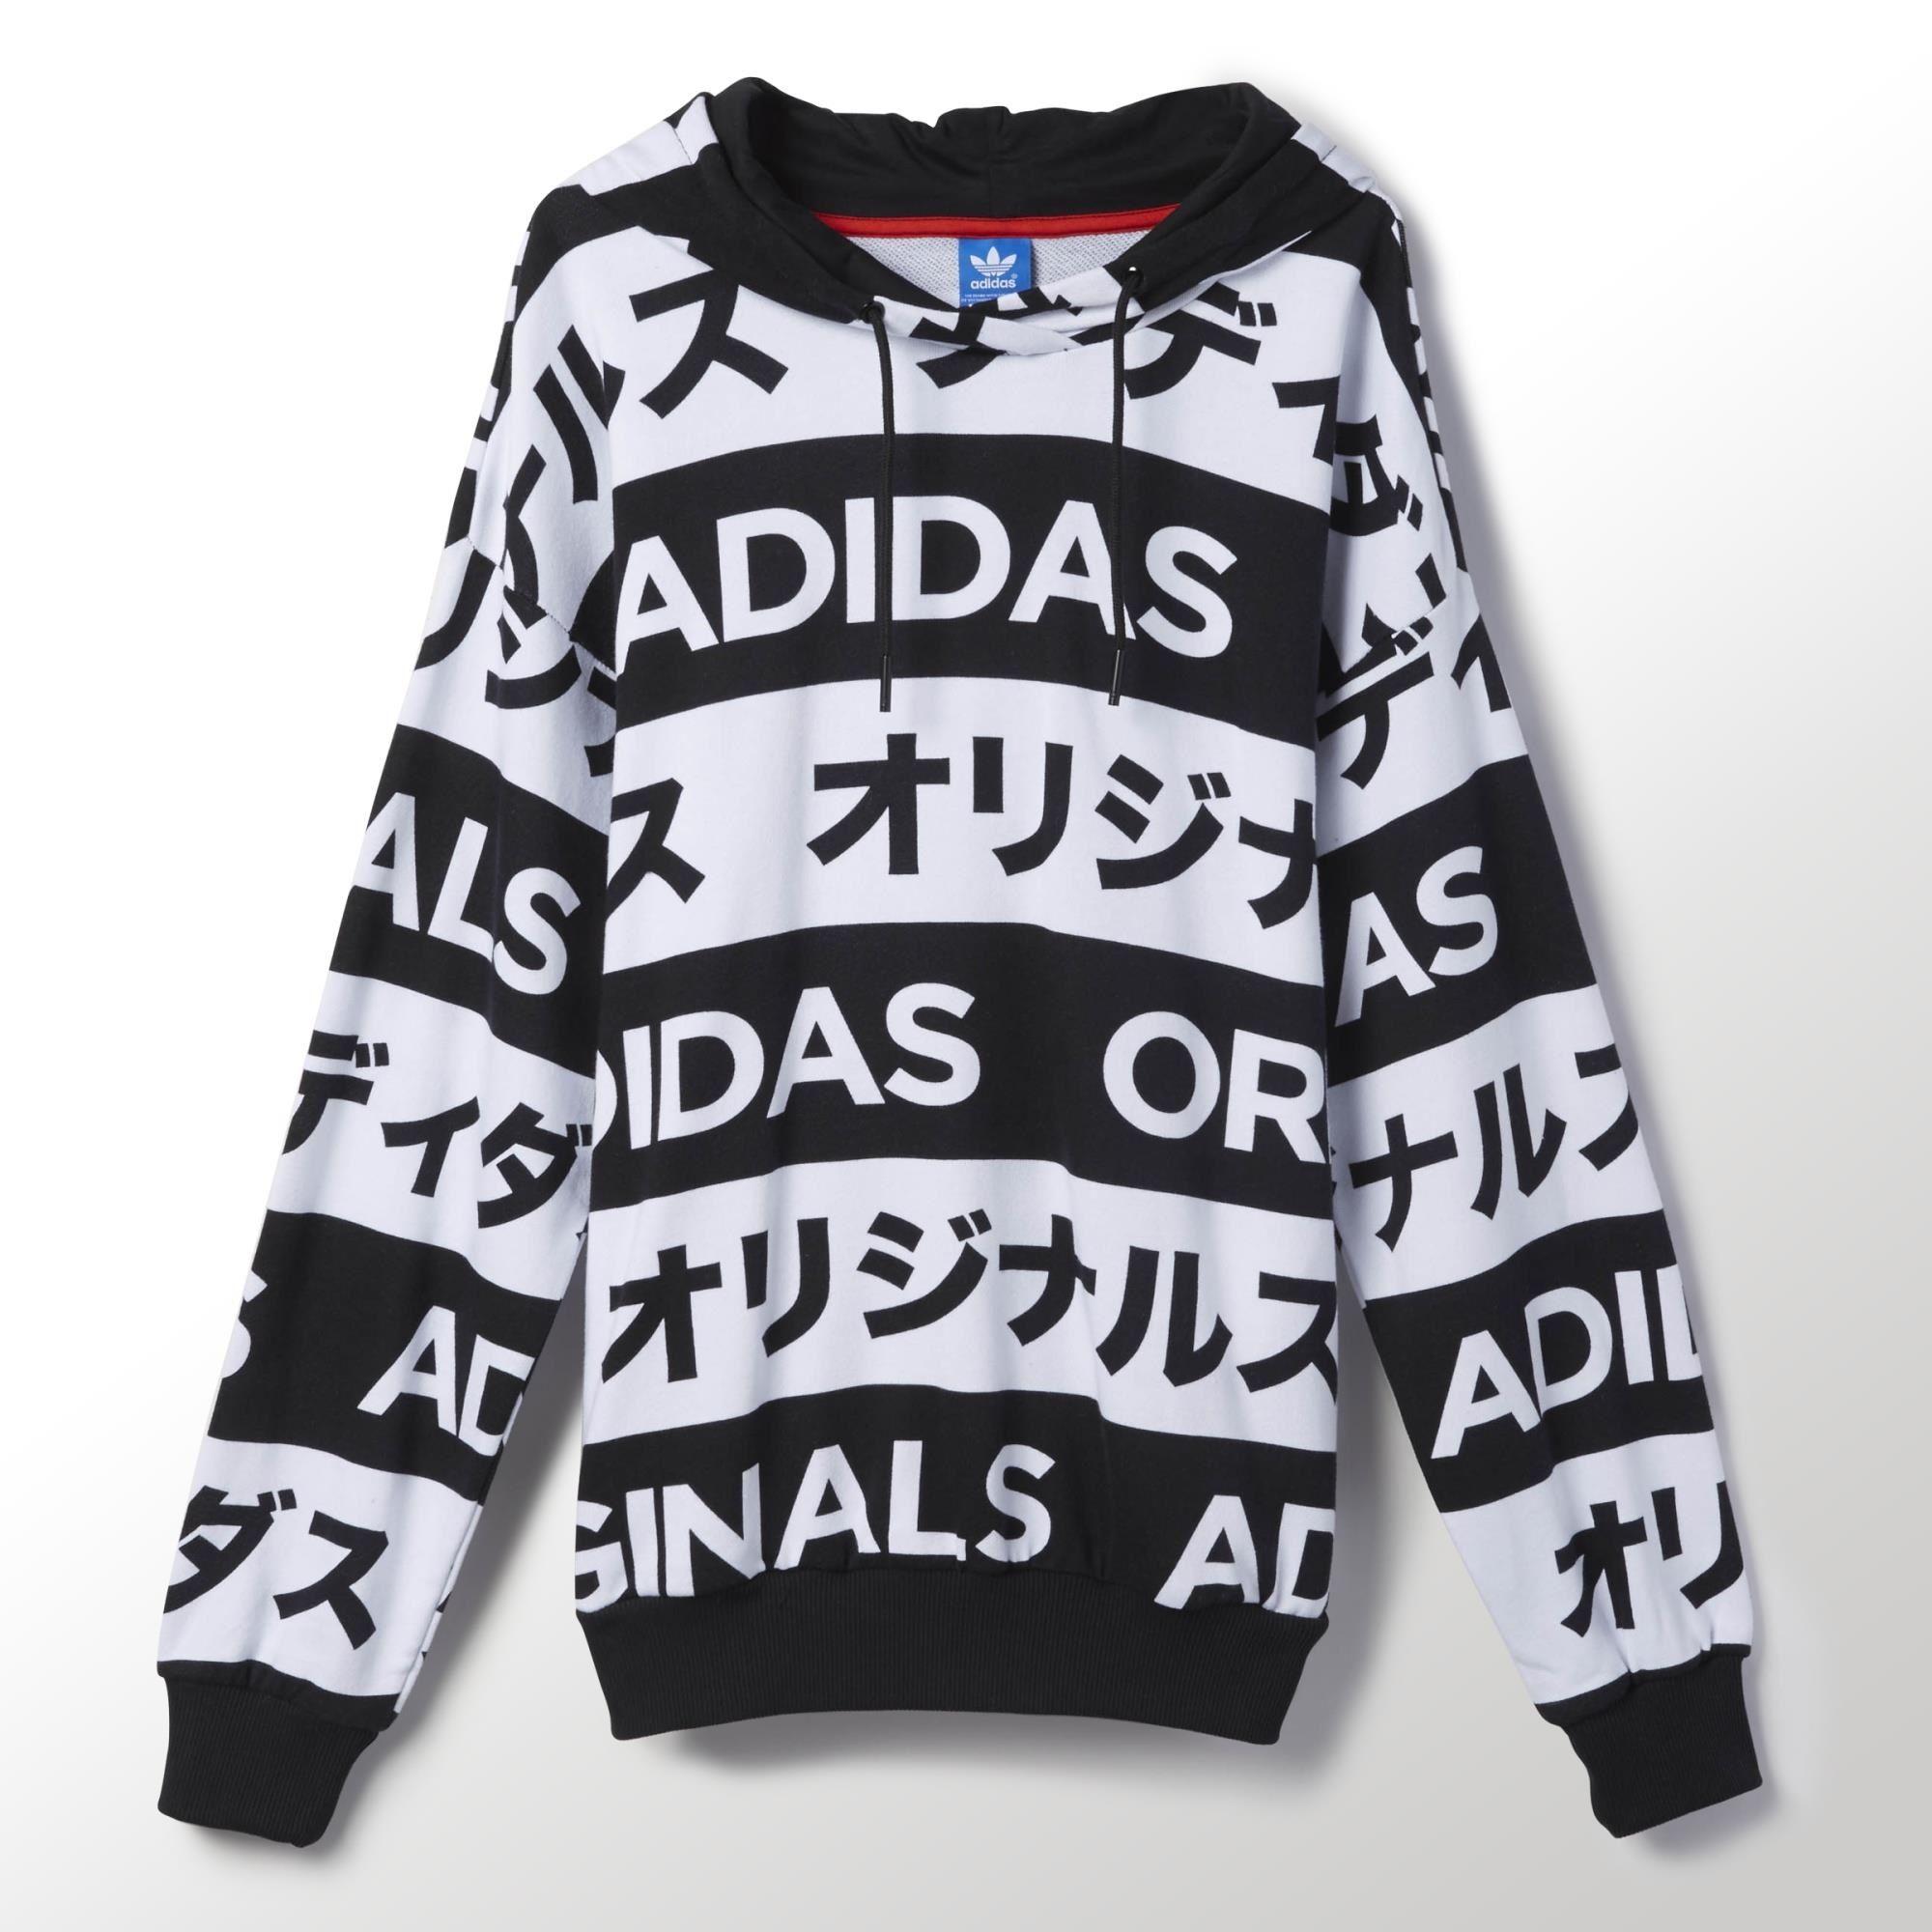 adidas Originals makes a statement in any language. Black and white bands  of Japanese katakana